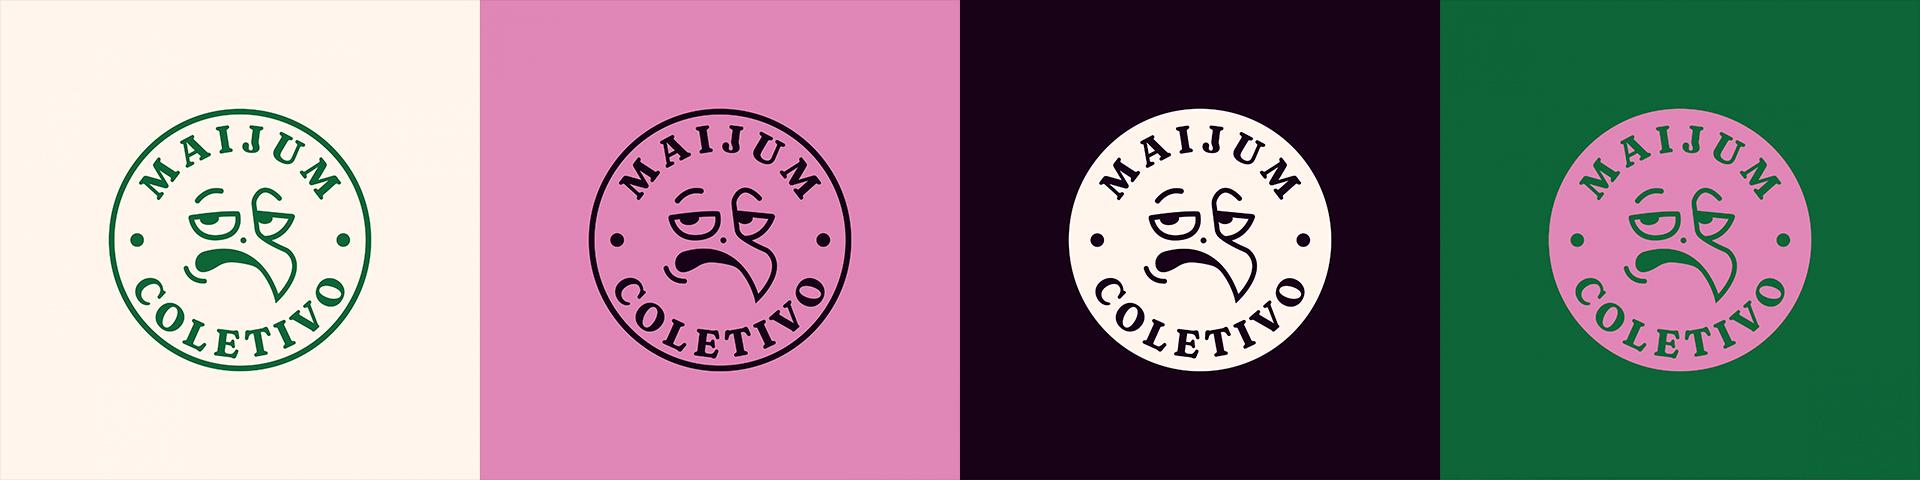 maijum-logos